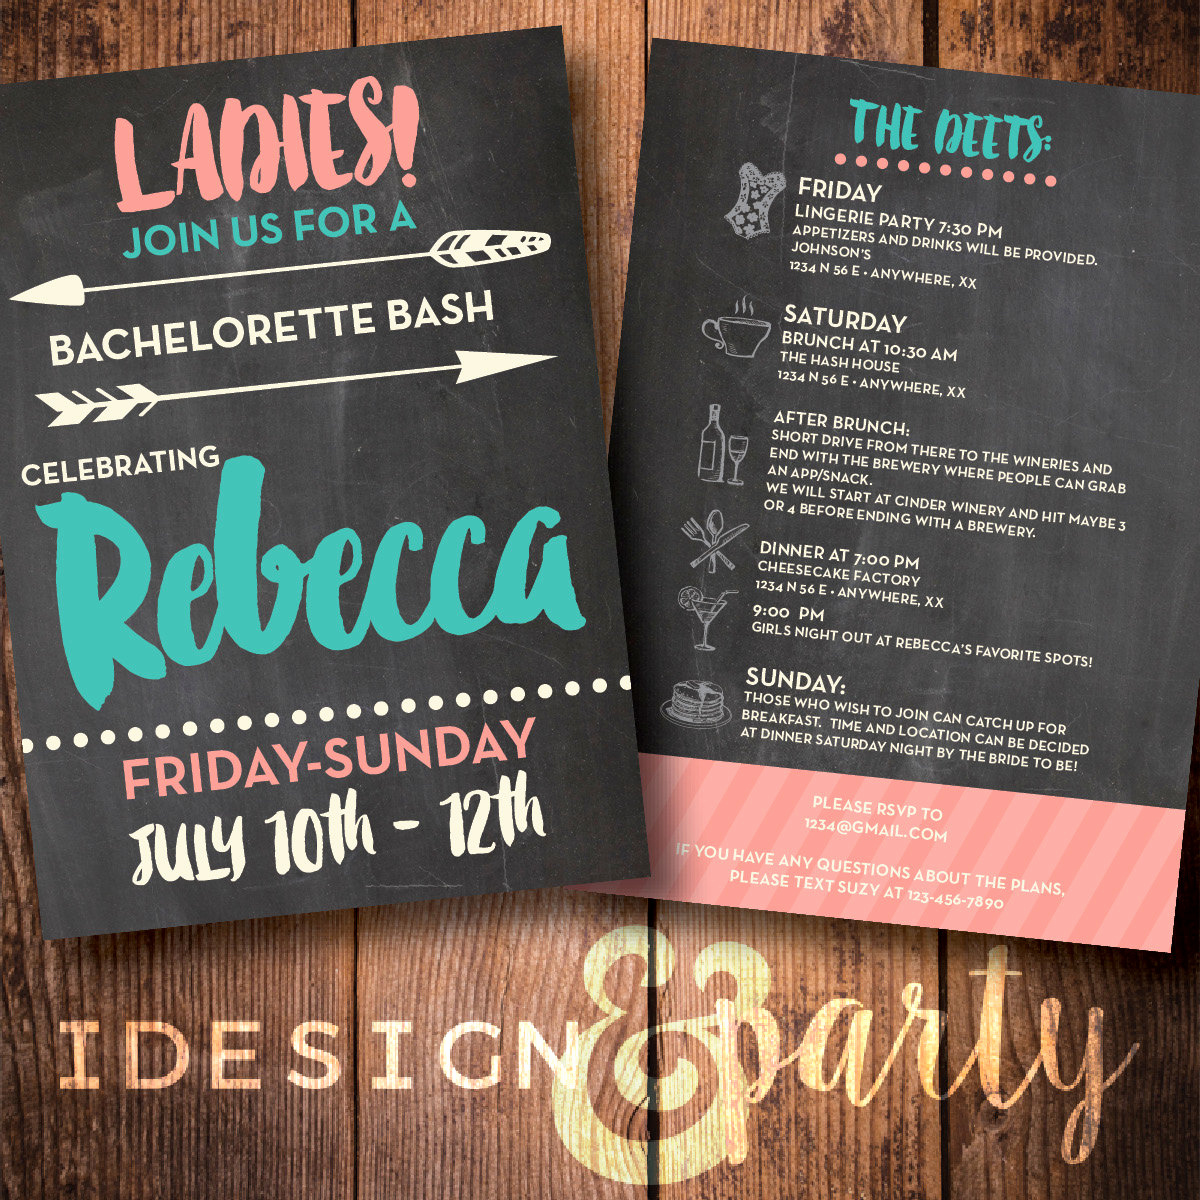 Bachelorette Party Invitation Wording Elegant Bachelorette Party Invite Weekend Bash